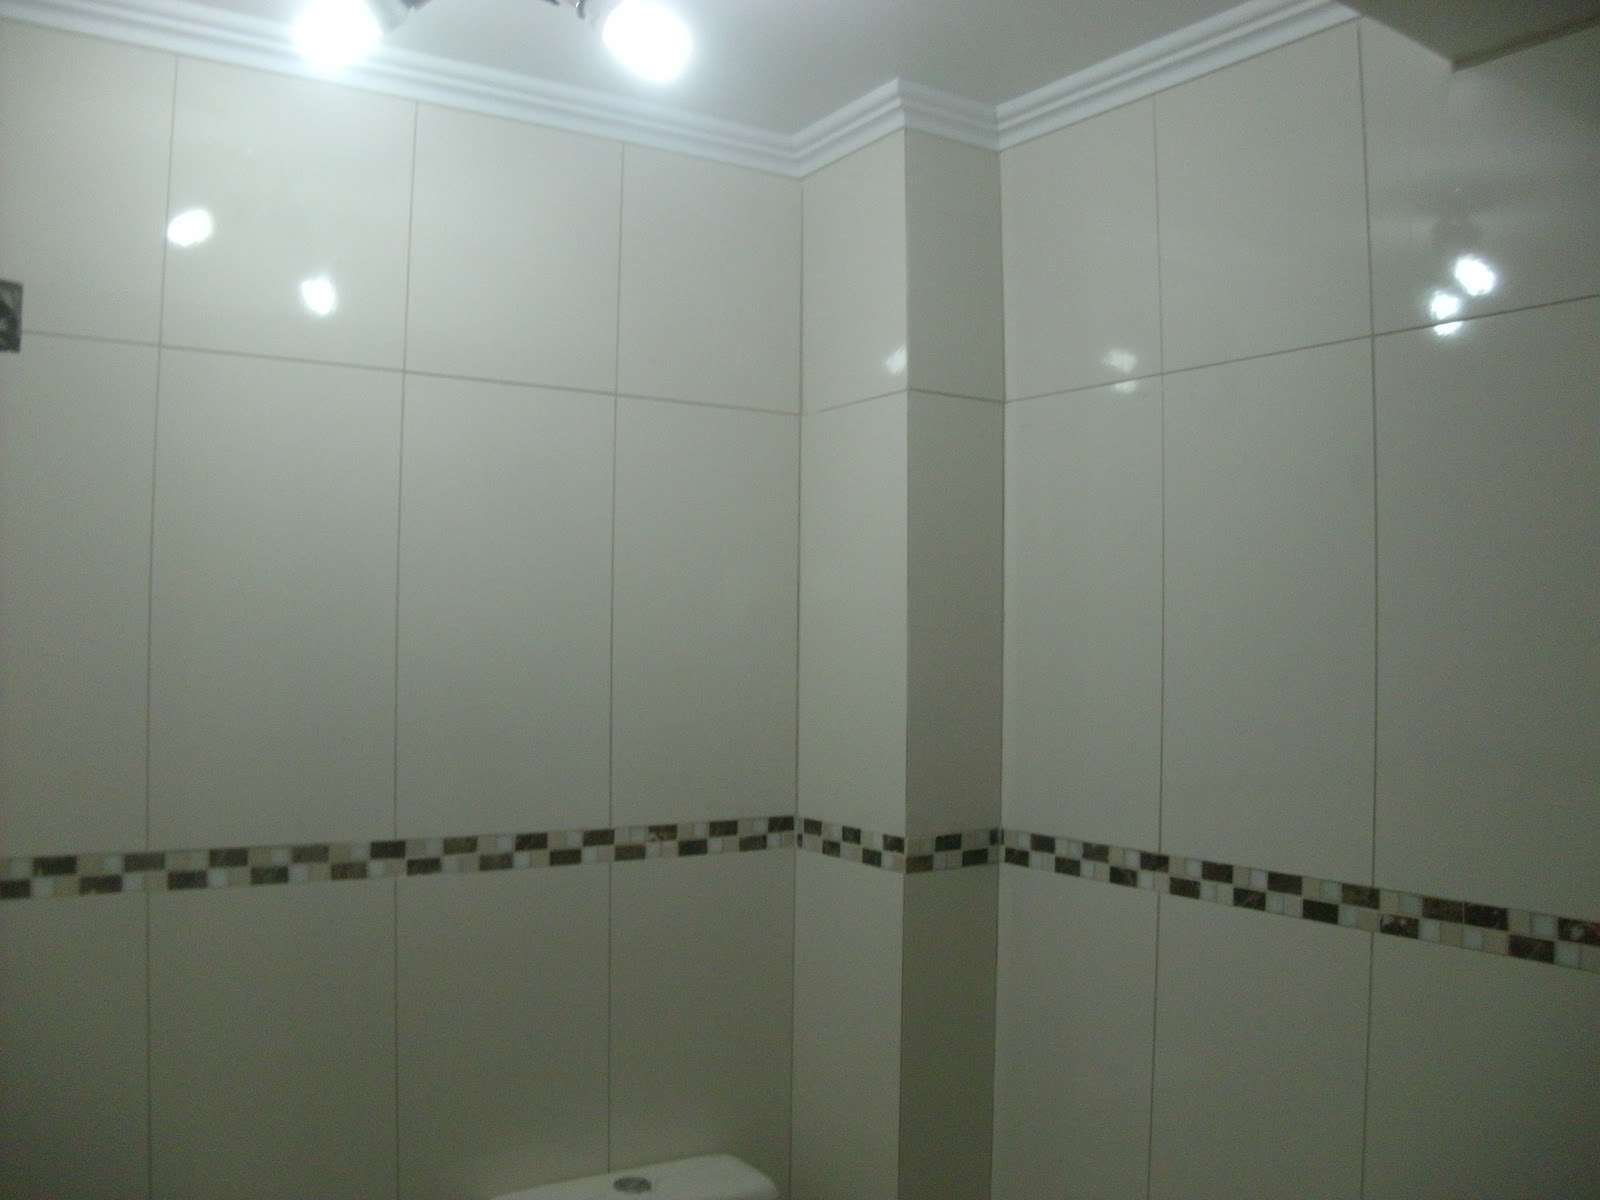 Piso e azulejo retificado e border pastilha de vidro. #575444 1600x1200 Banheiro Azulejo